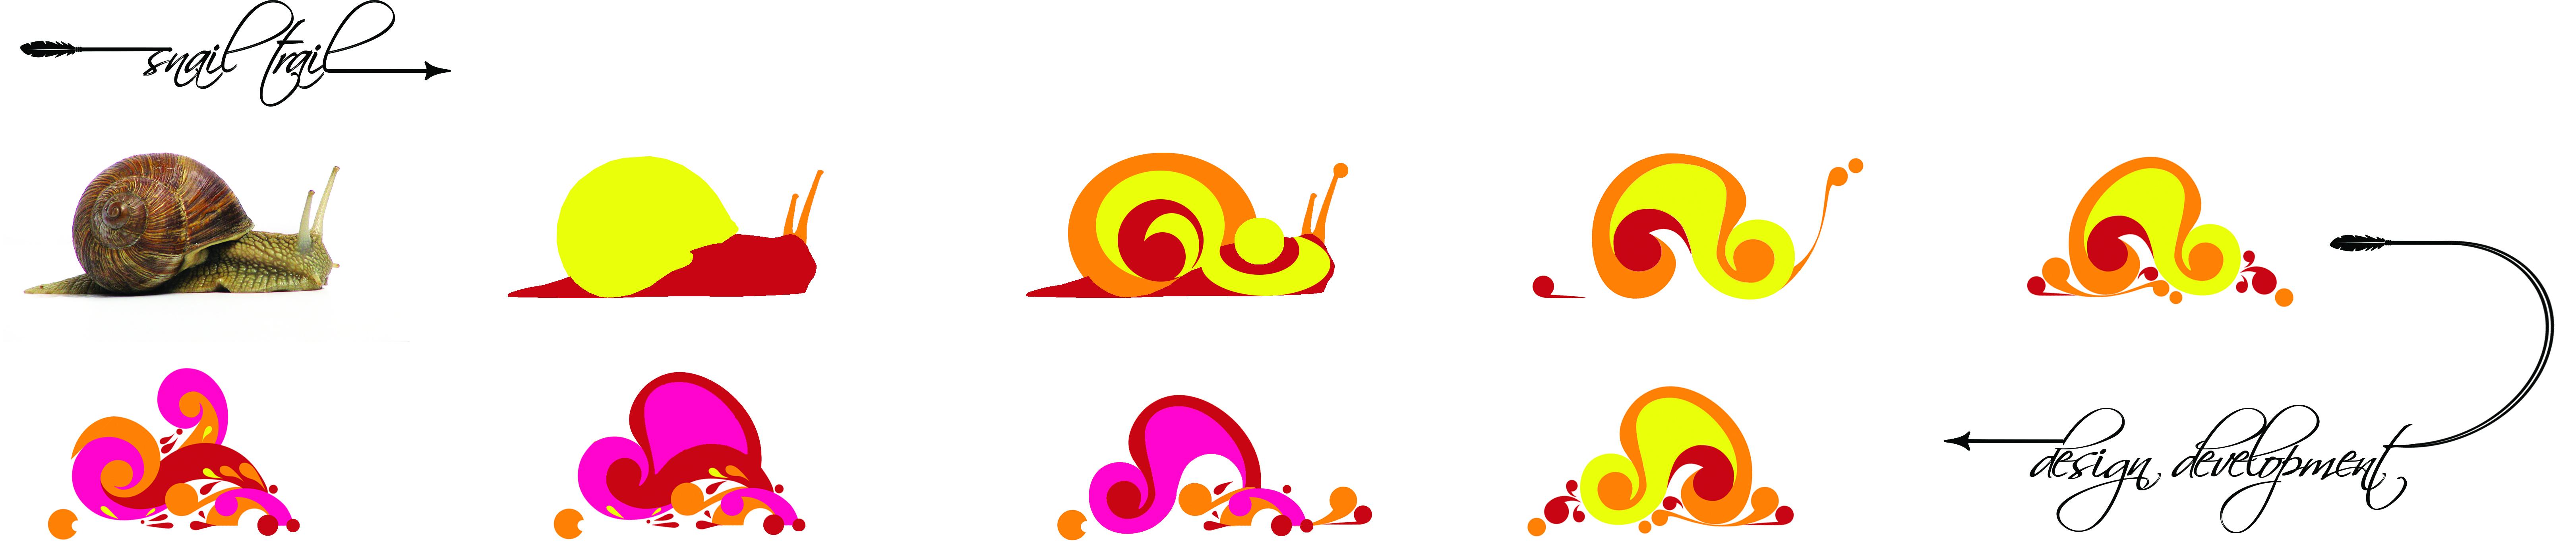 Snail Trailjpg